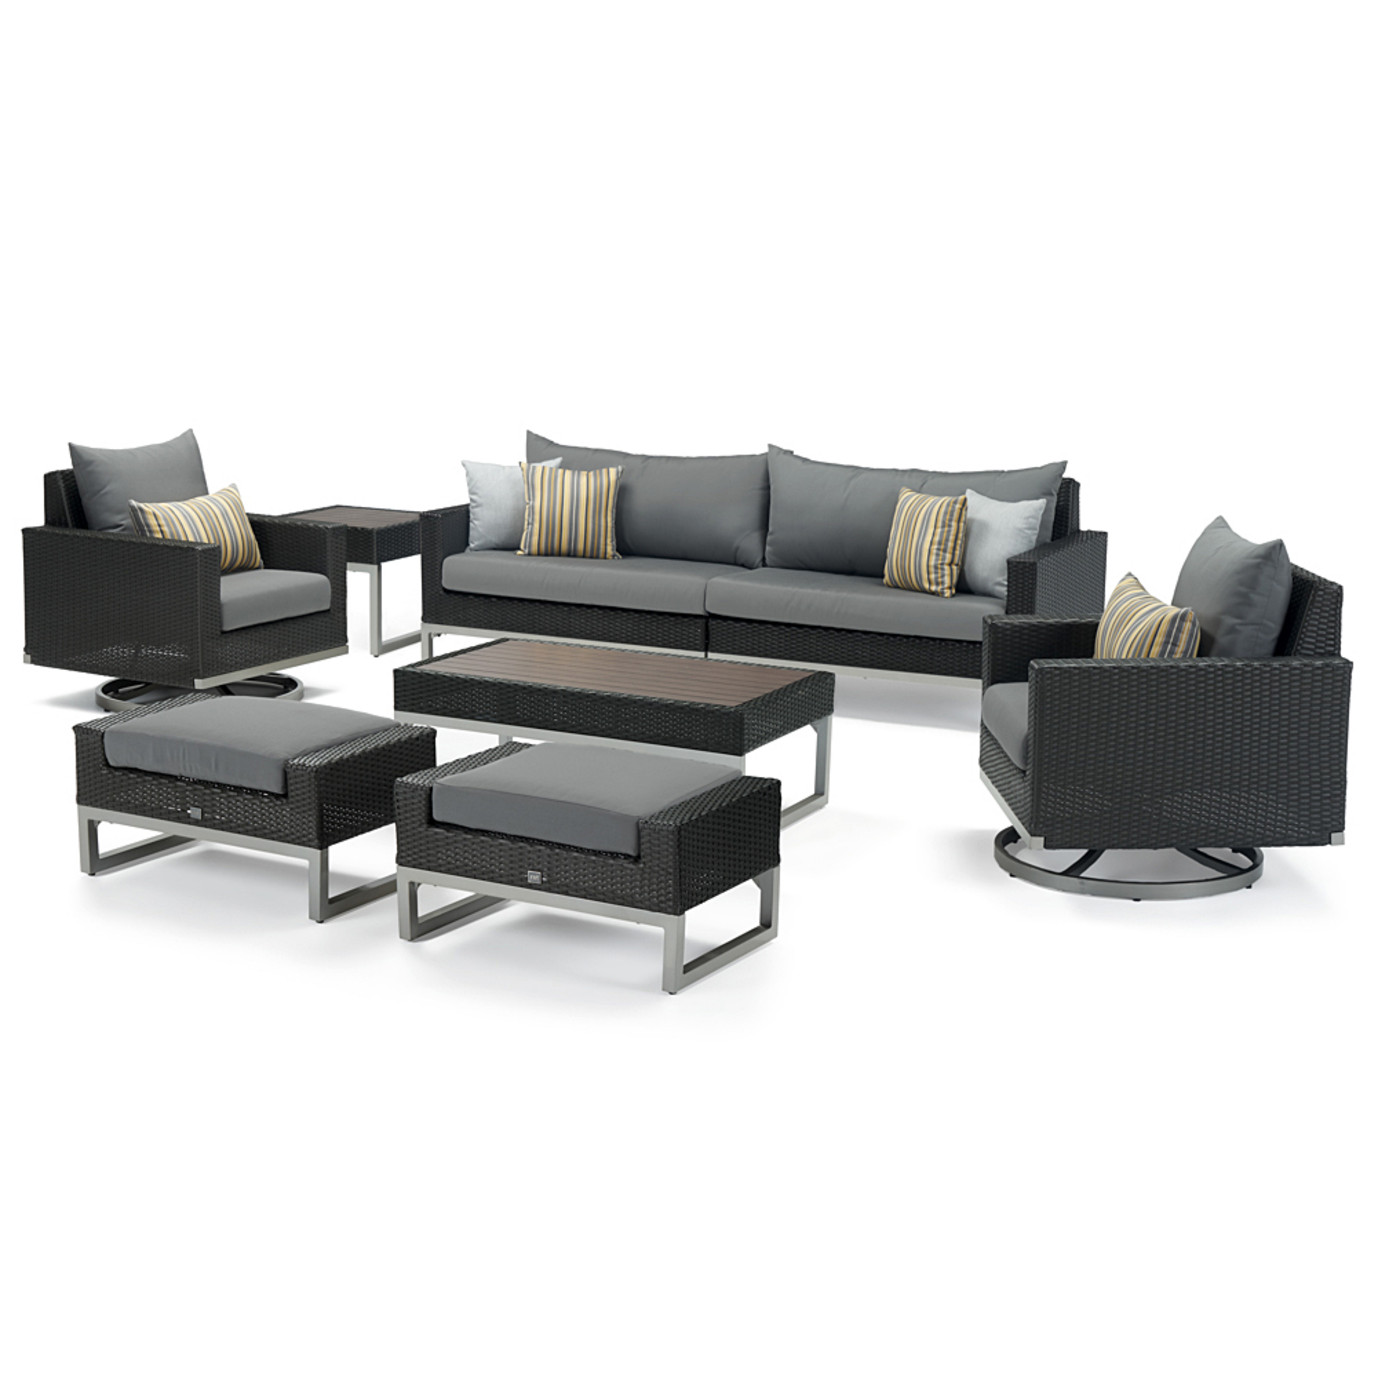 Milo™ Espresso 8 Piece Motion Seating Set - Charcoal Gray